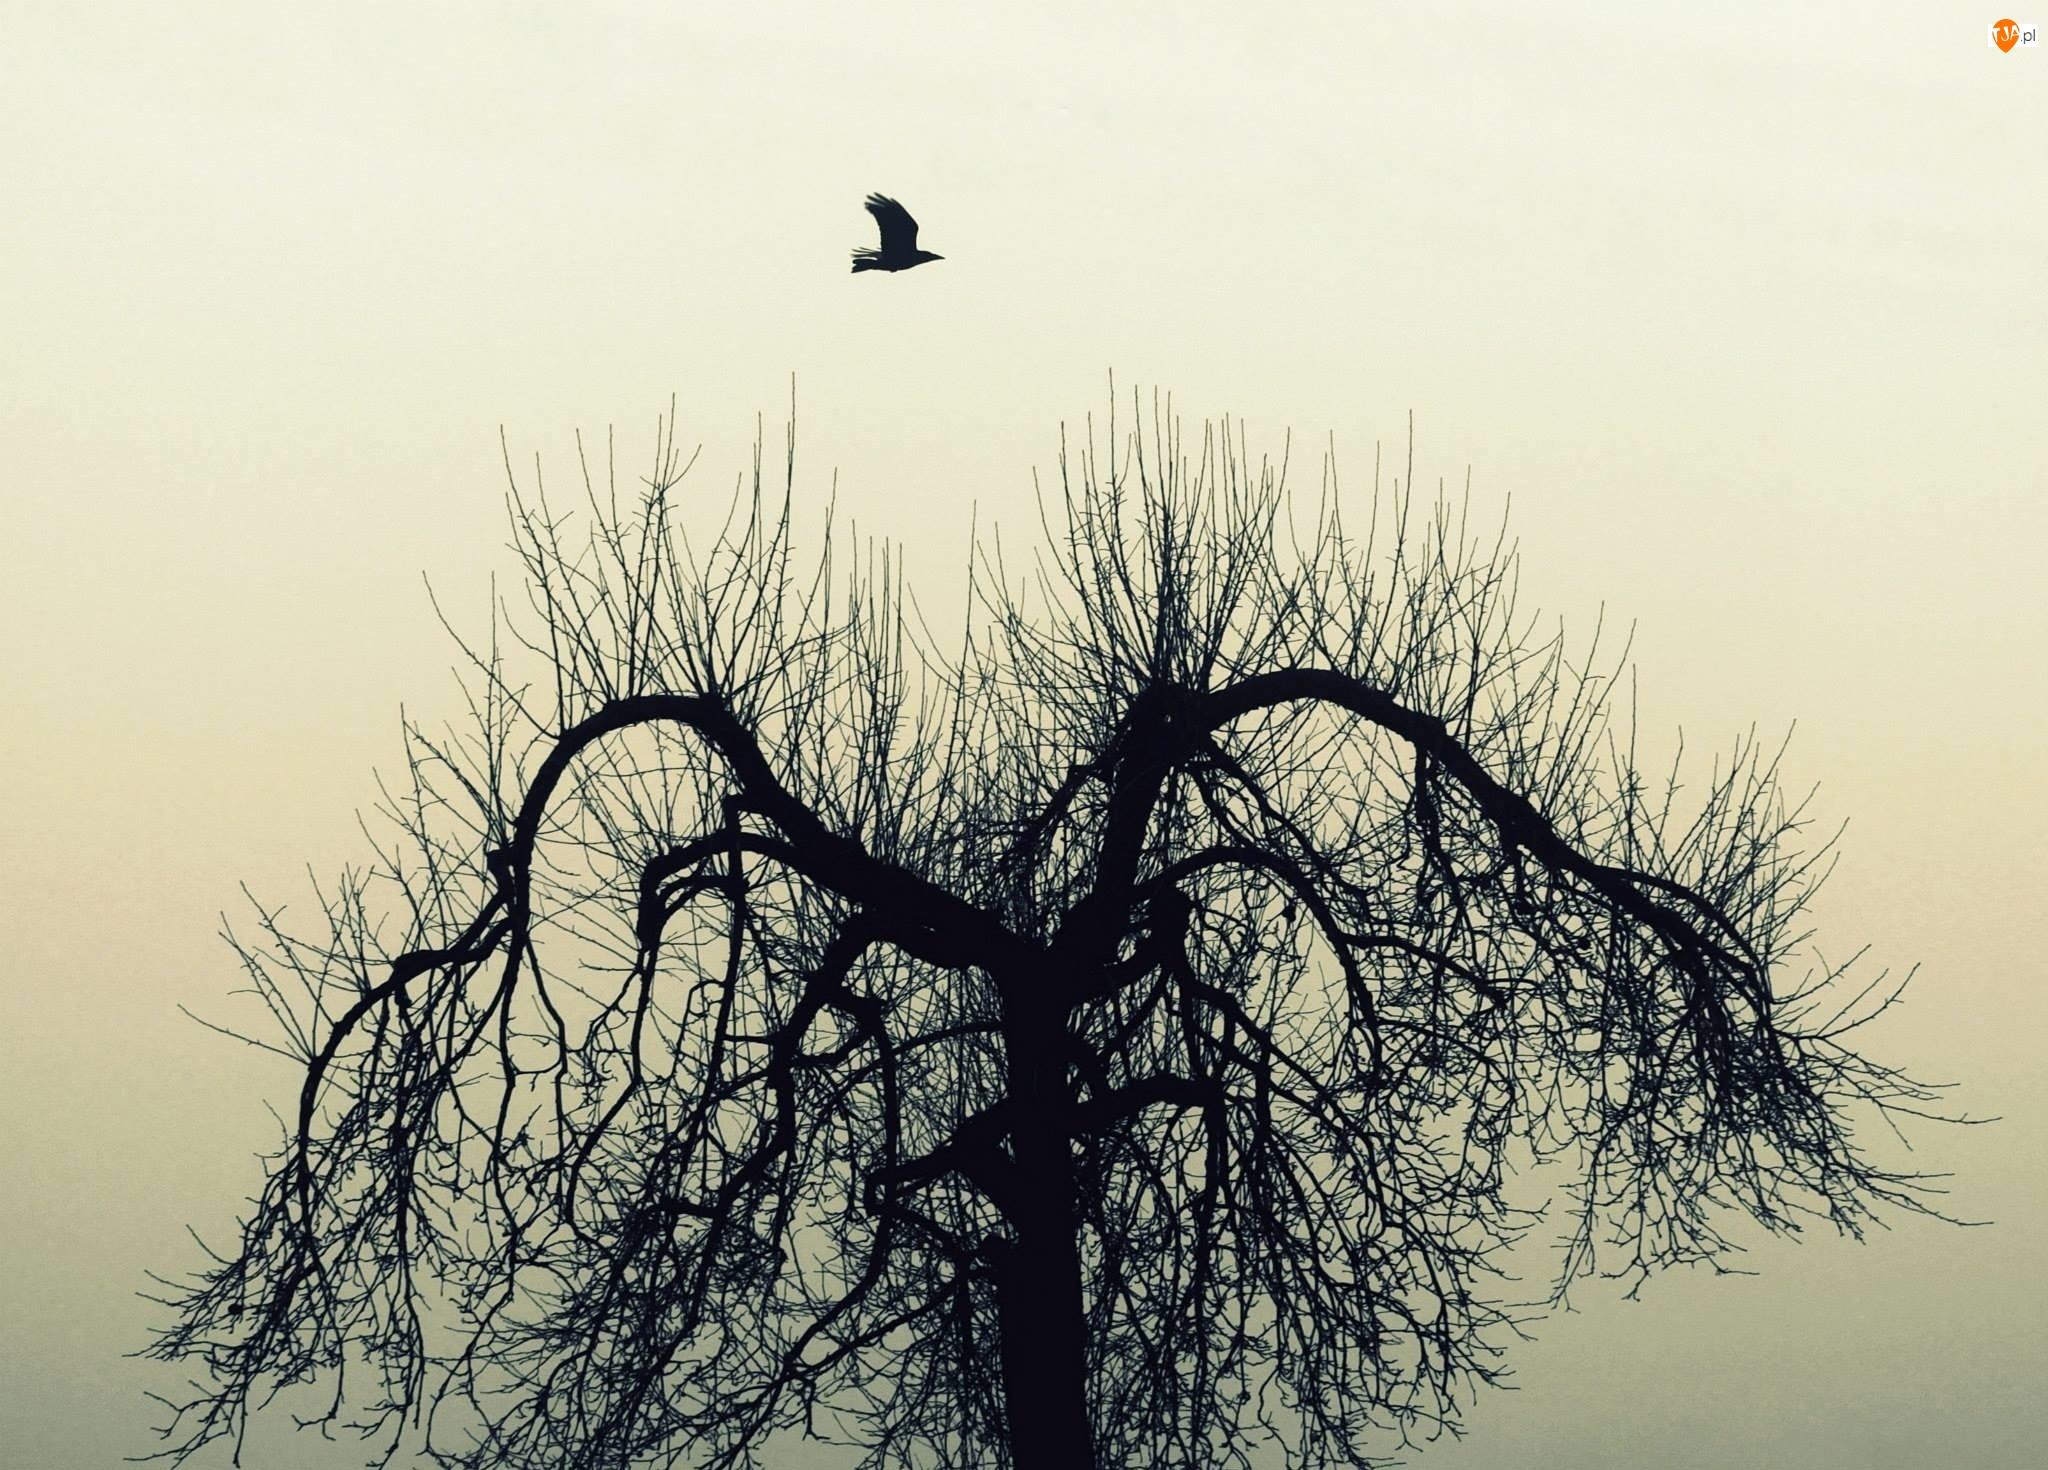 Drzewo, Ptak